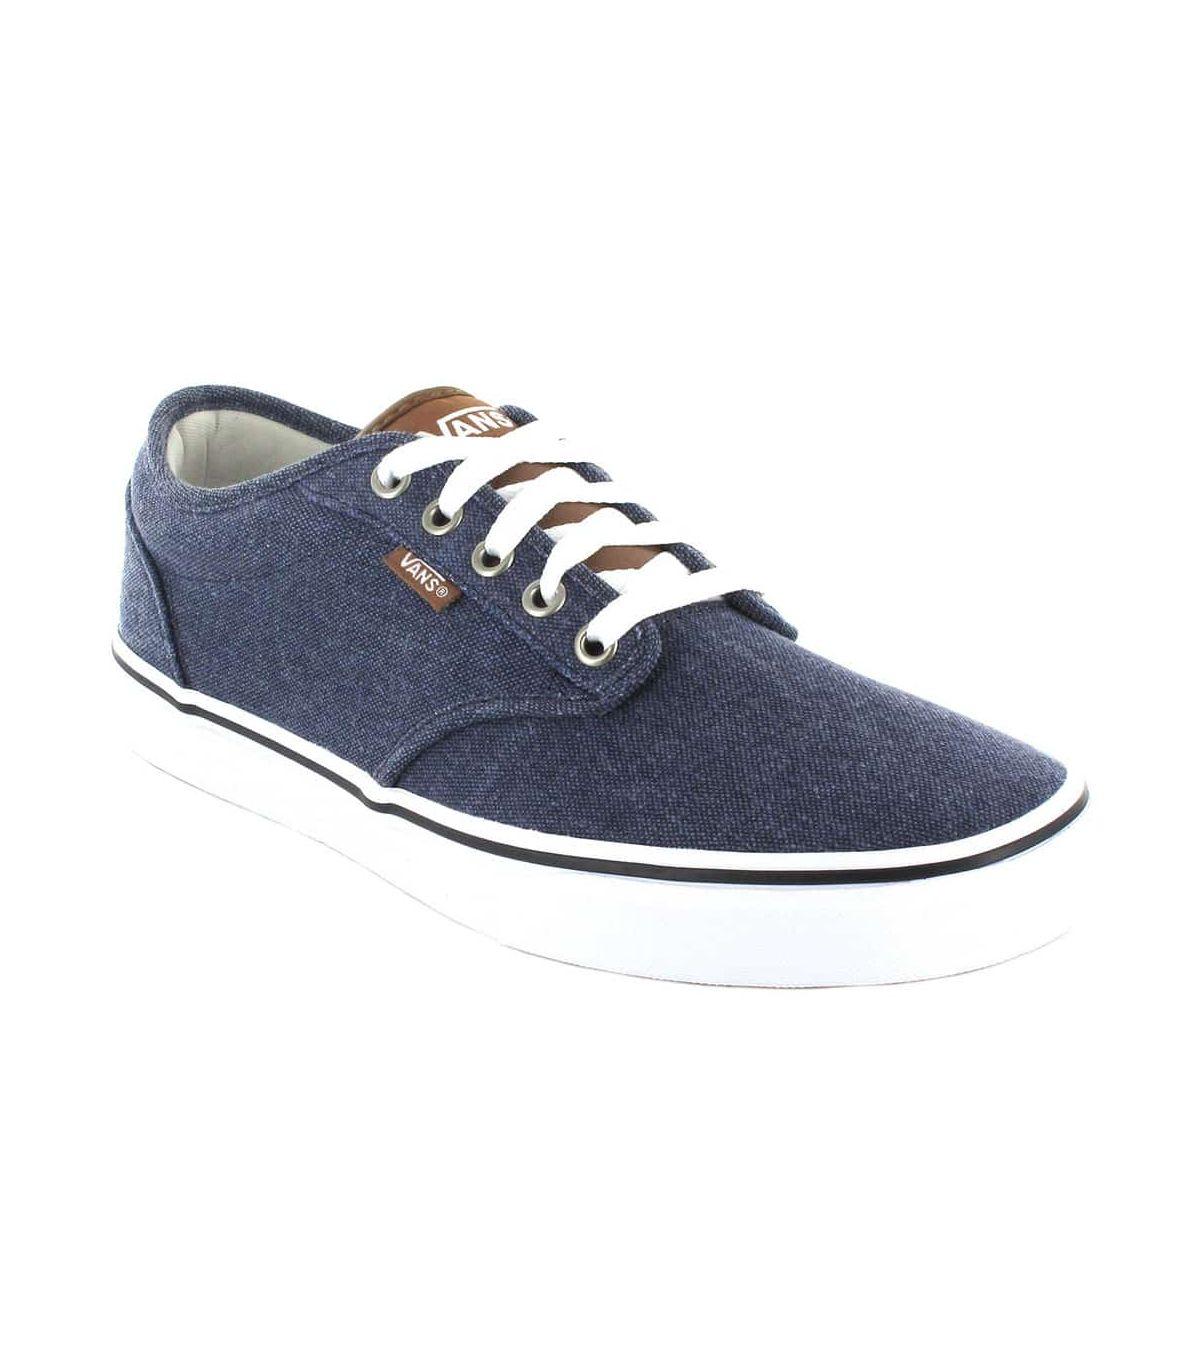 Vans Atwood Blue Vans Casual Footwear Man Lifestyle Sizes: 41, 42, 43, 44, 45; Color: blue